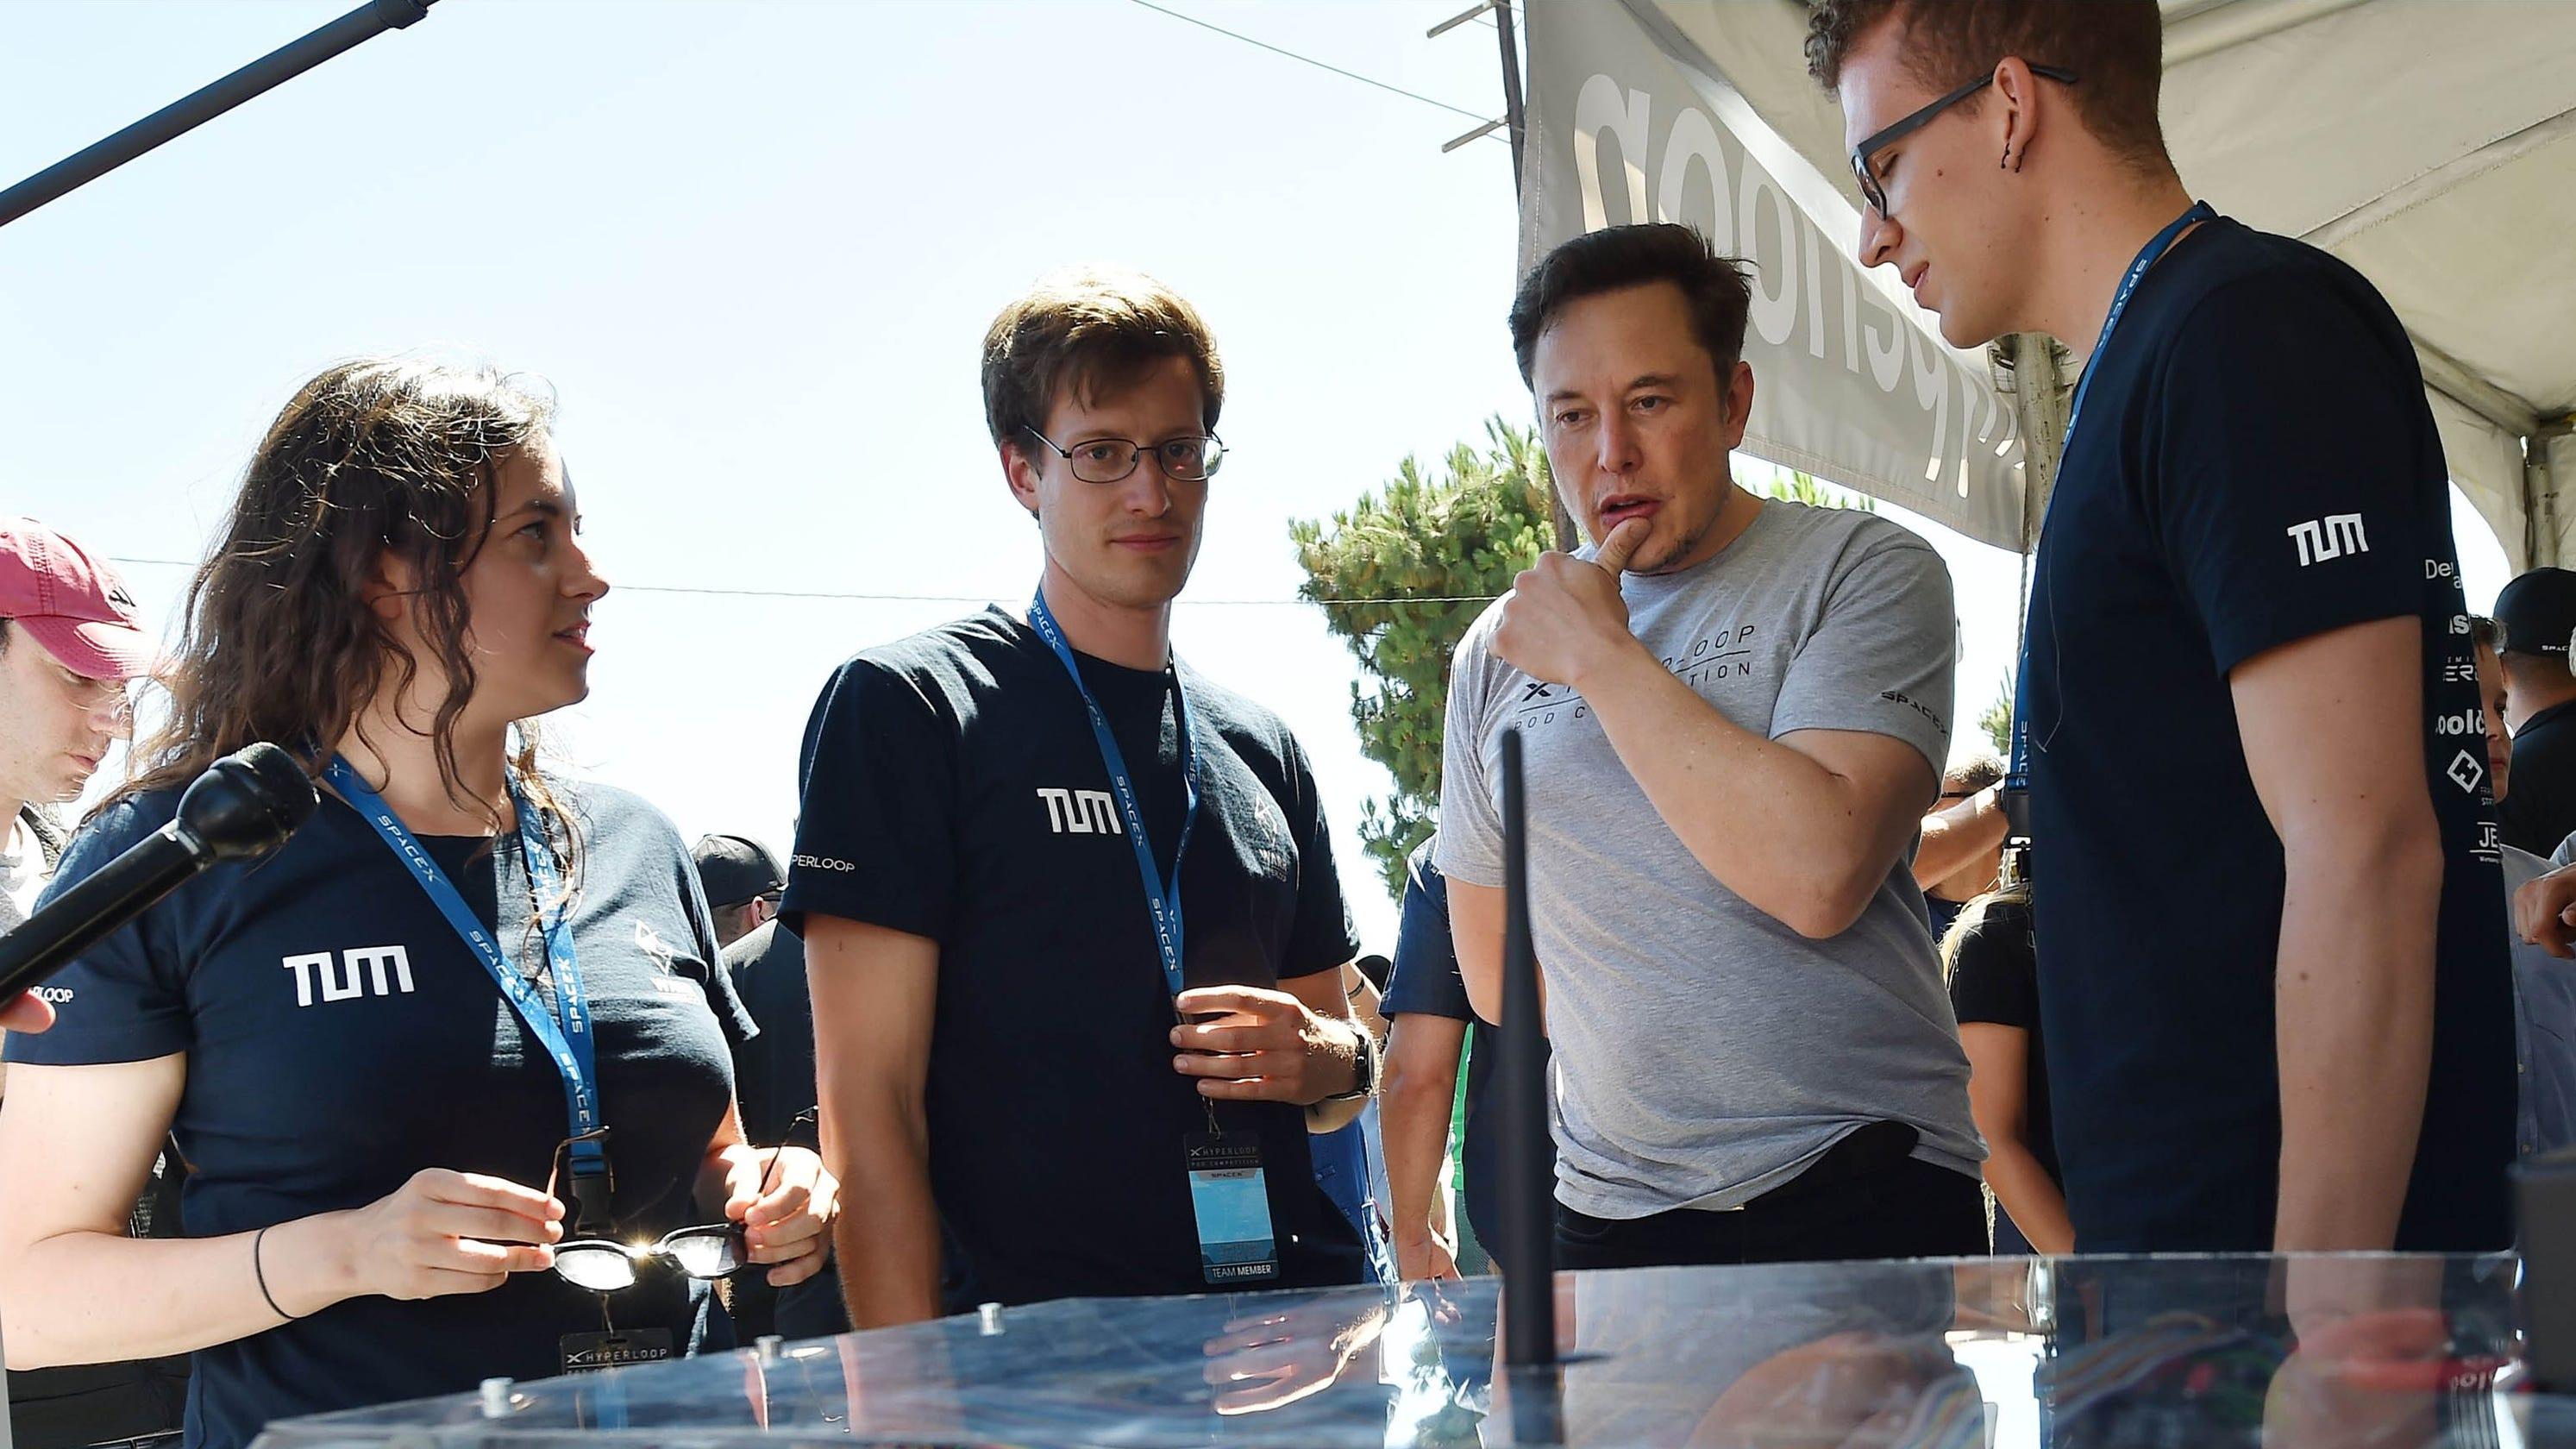 Could Elon Musk's Tesla tweet lead to legal trouble?